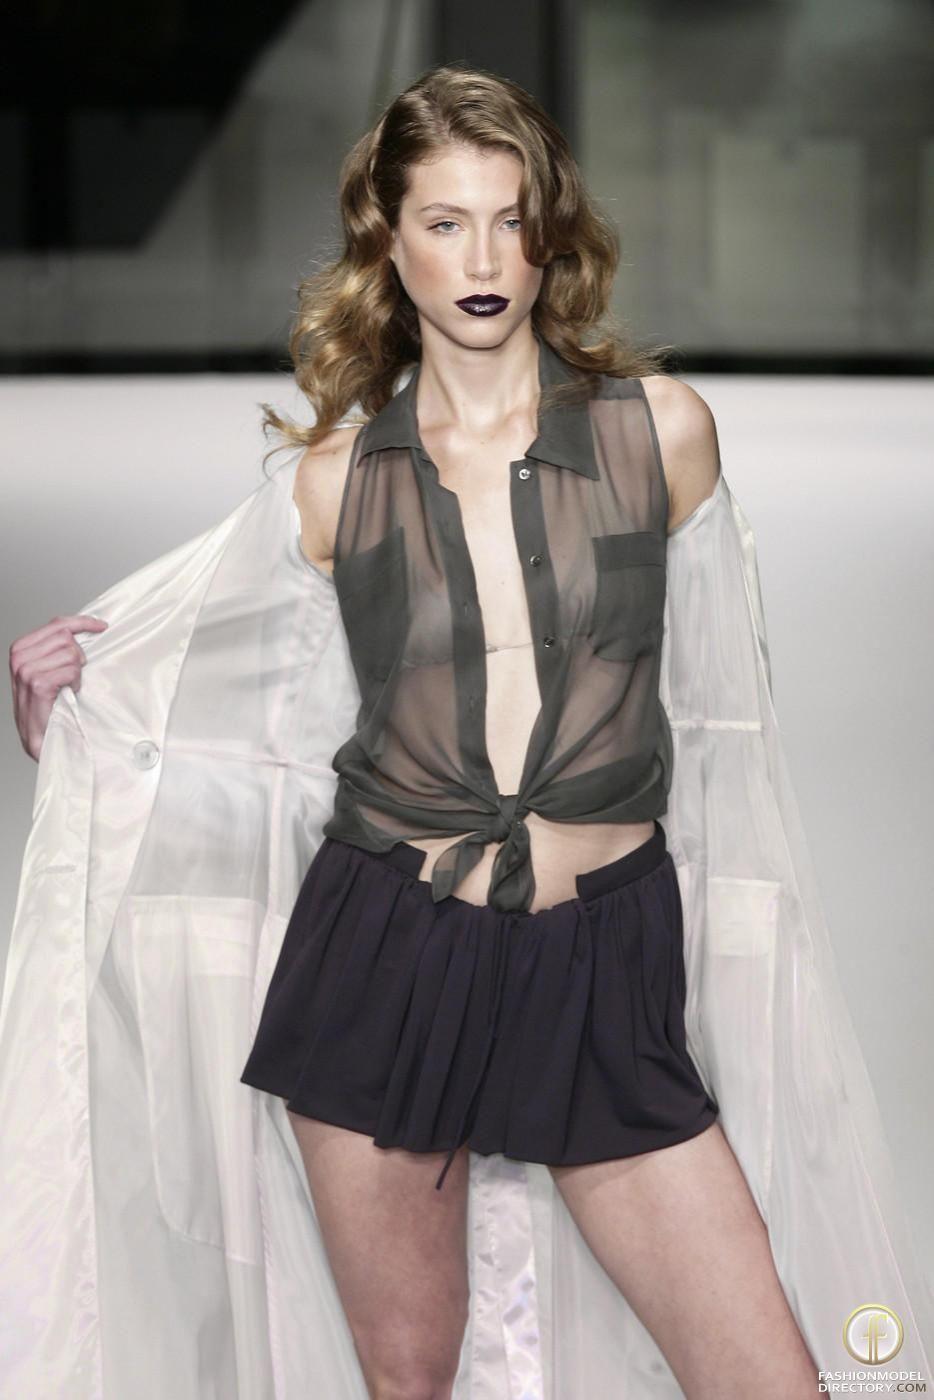 Photo of Myka Dunkle - Fashion Model - ID373463 - Profile on FMD